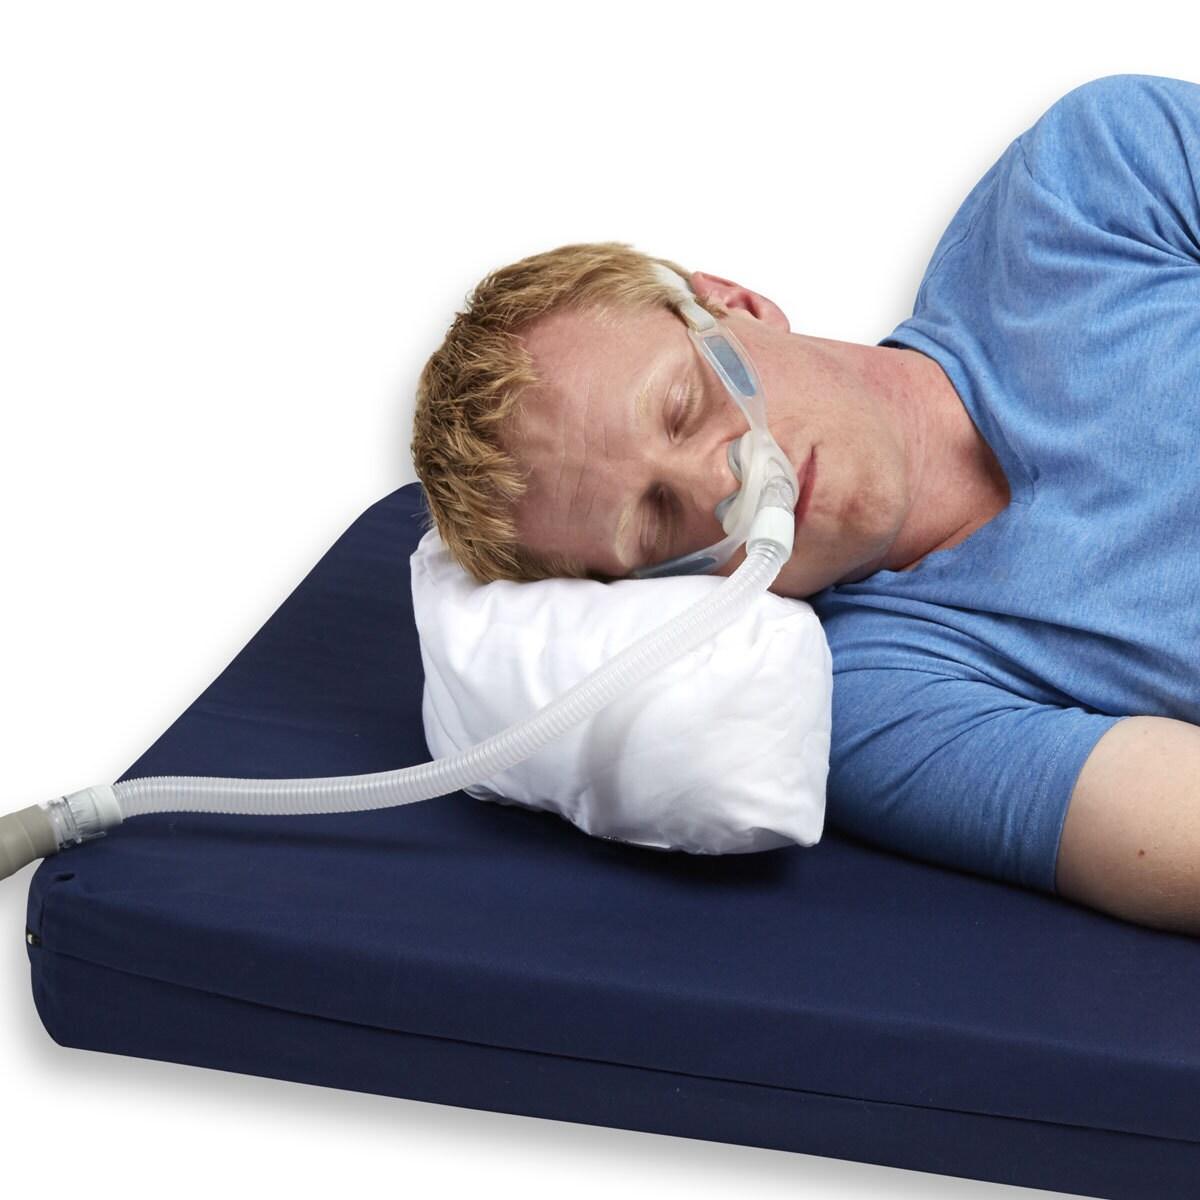 Hermell Mini Travel Cpap Sleep Apnea Pillow, Natural